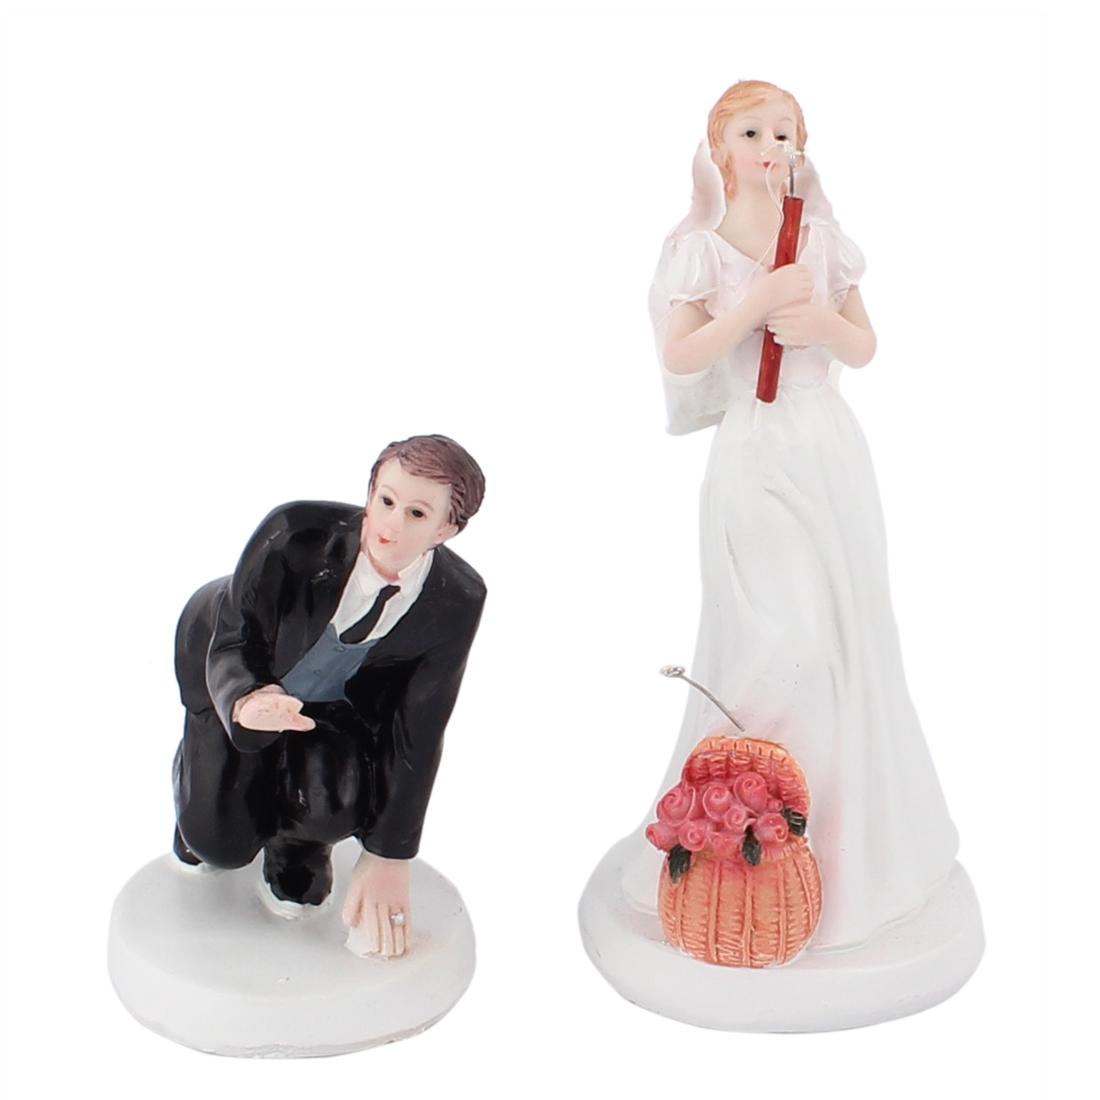 Fishing Couple Groom Bride Humor Figurine Wedding Cake Topper Decoration Gift